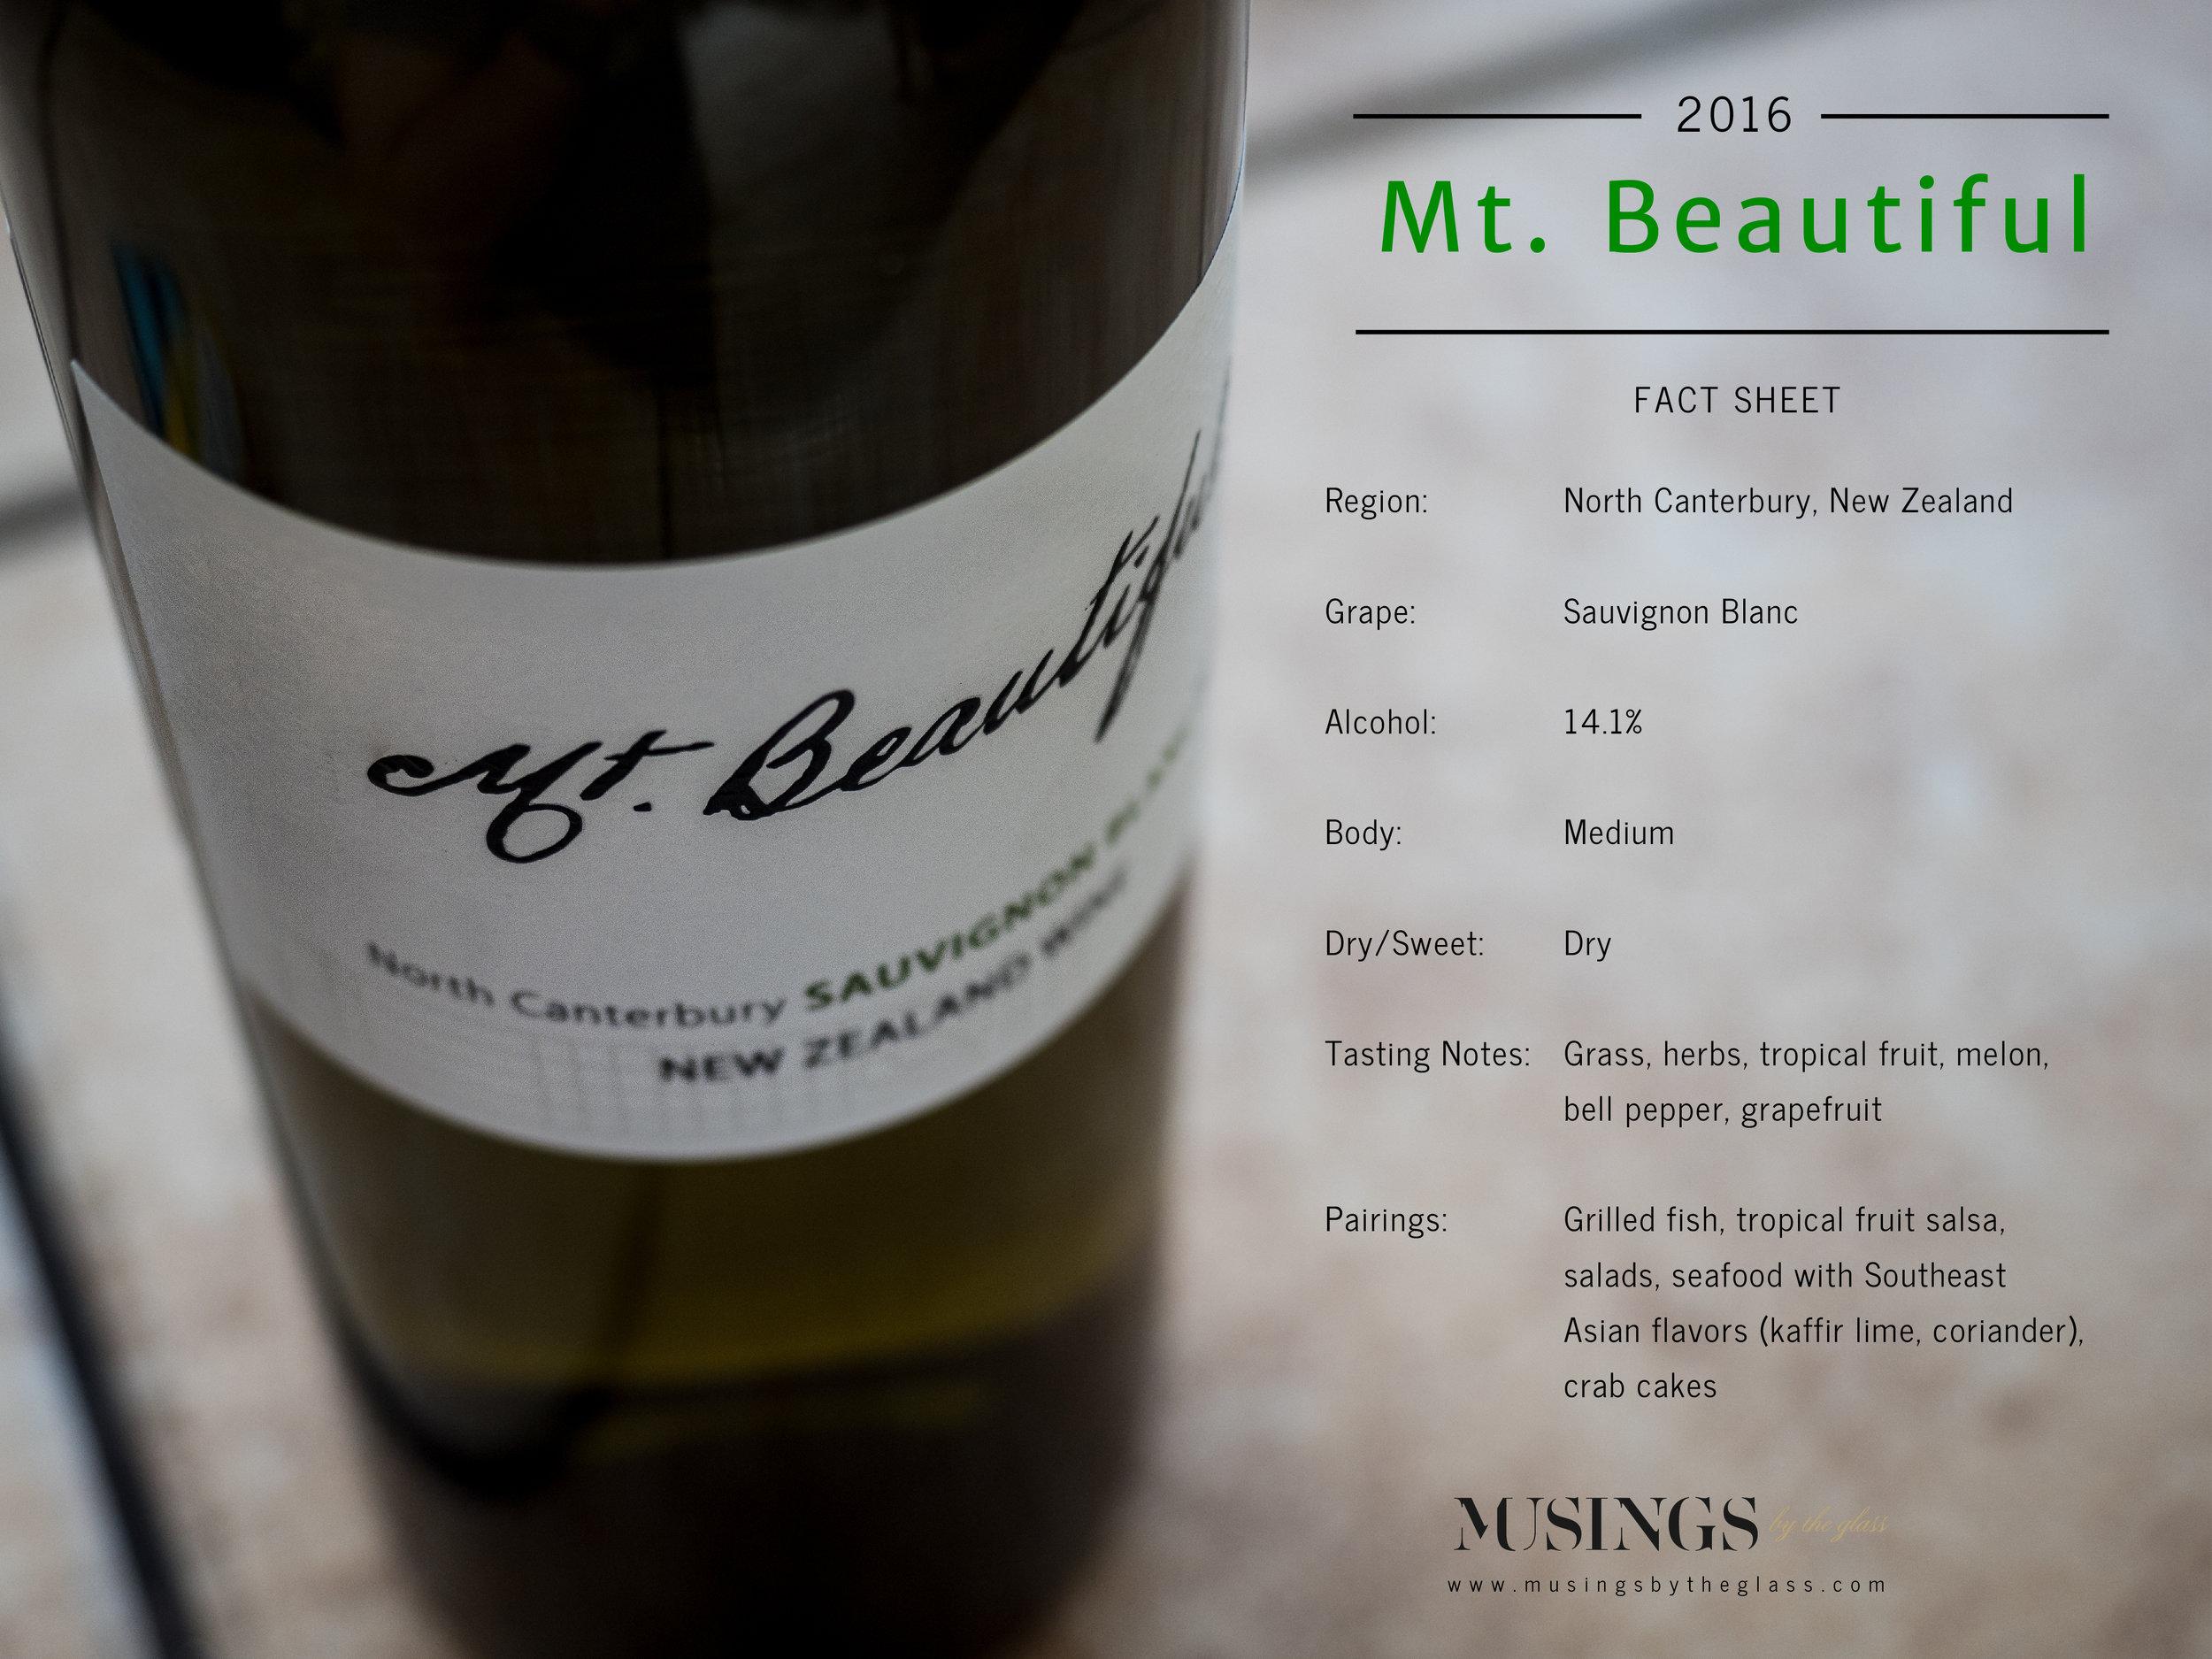 Musings by the Glass - The Pineapple-Kiwi Combination - Mt. Beautiful Sauvignon Blanc Fact Sheet